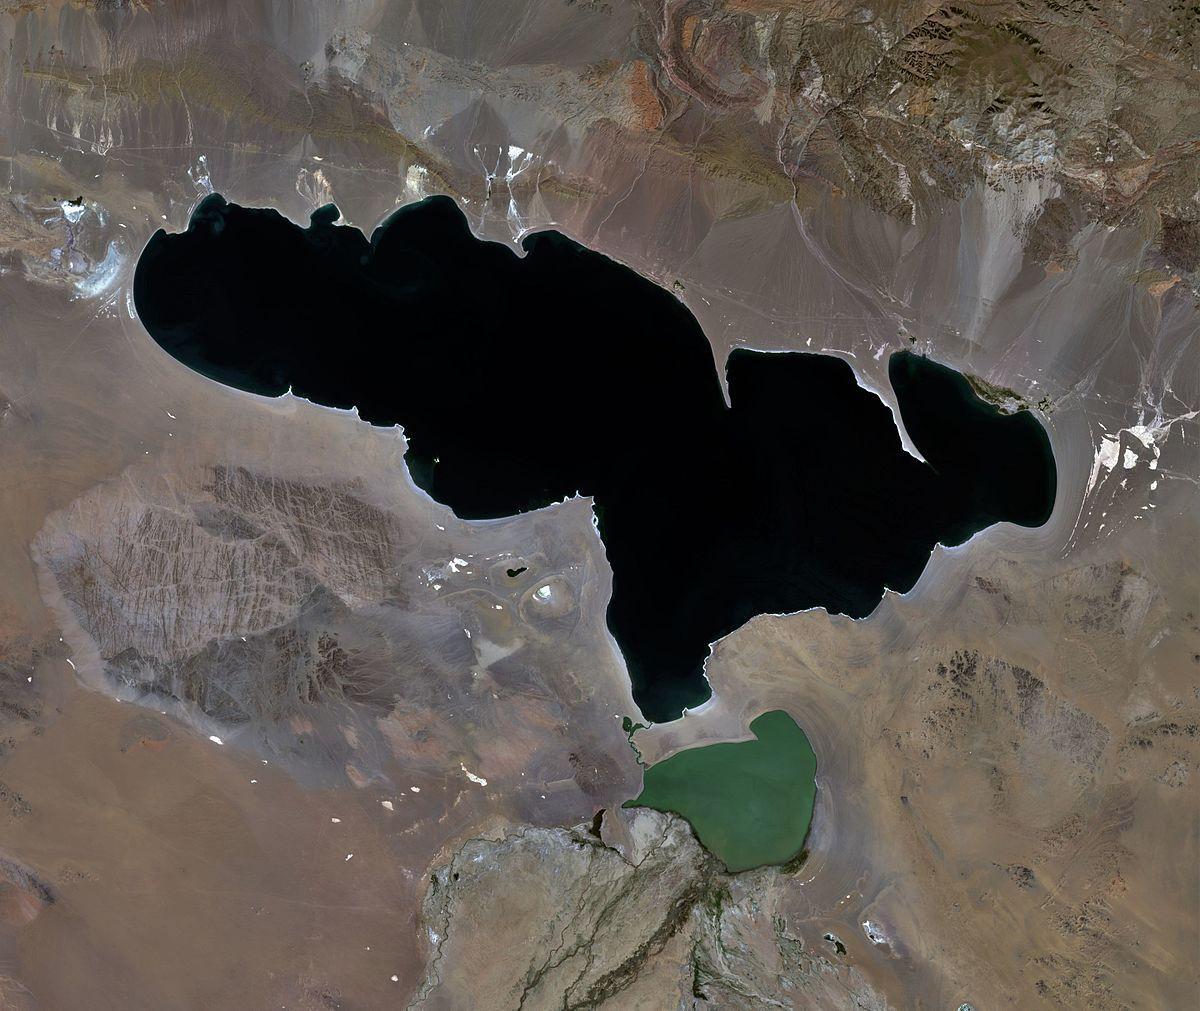 Khyargas_Nuur_and_Airag_Nuur_lakes,_Mongolia,_Landsat_image,_07-28-2015.jpg